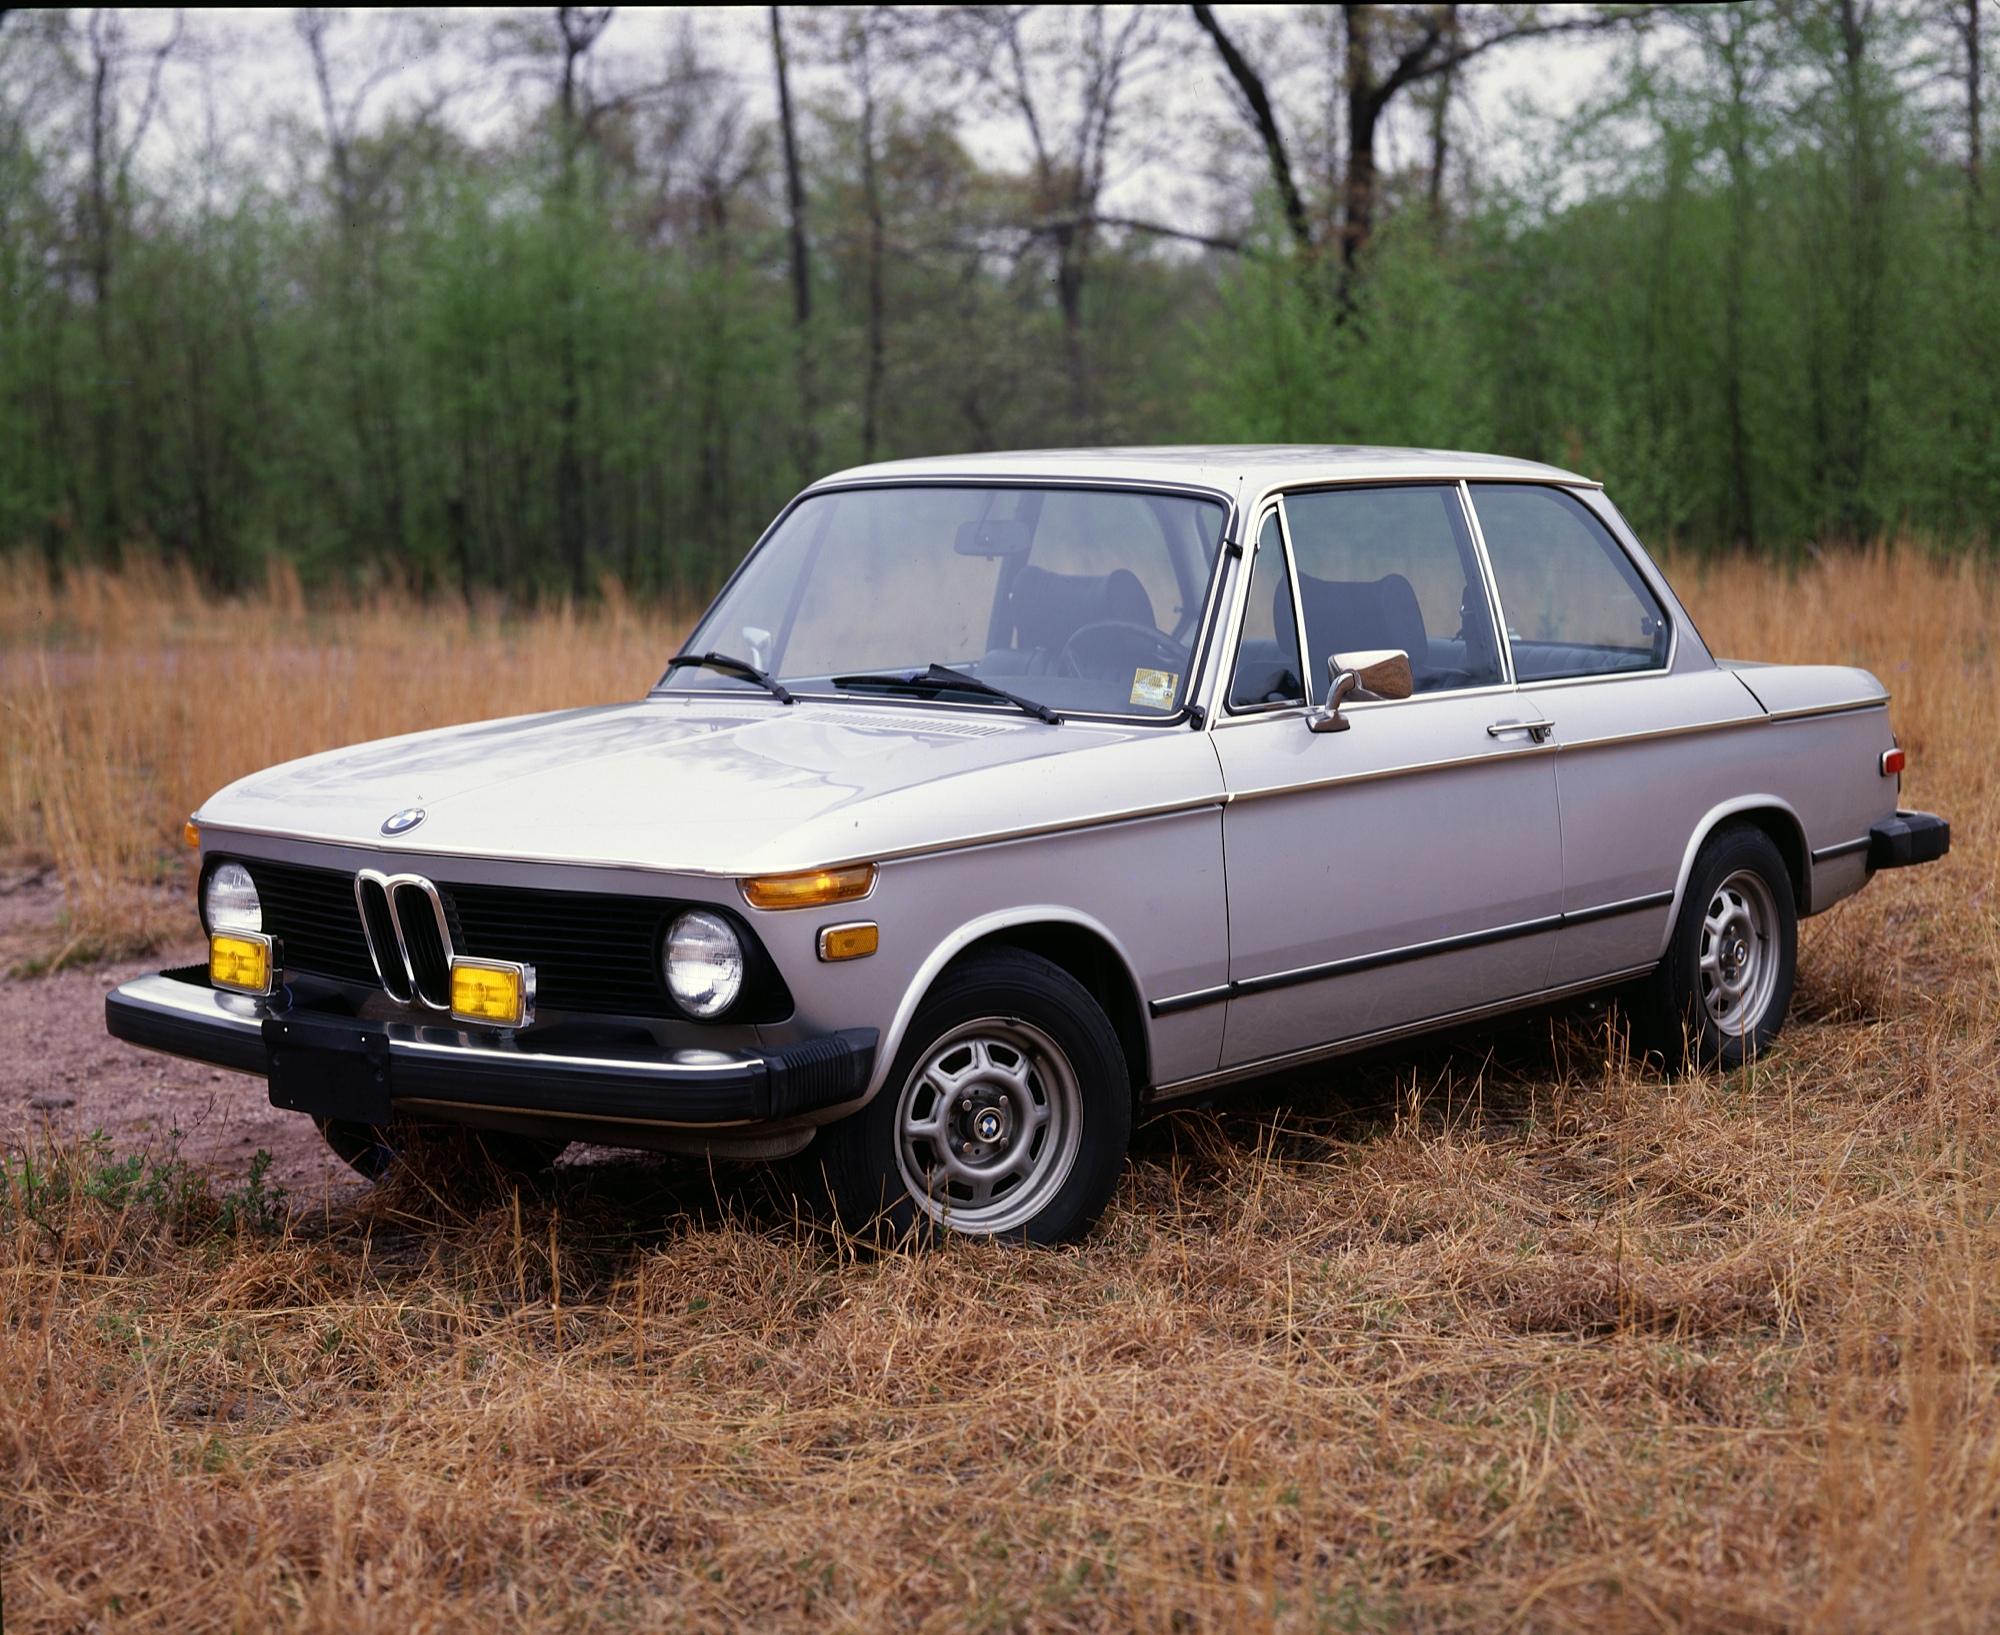 sev Marchal Headlights - \'02 General Discussion - BMW 2002 FAQ